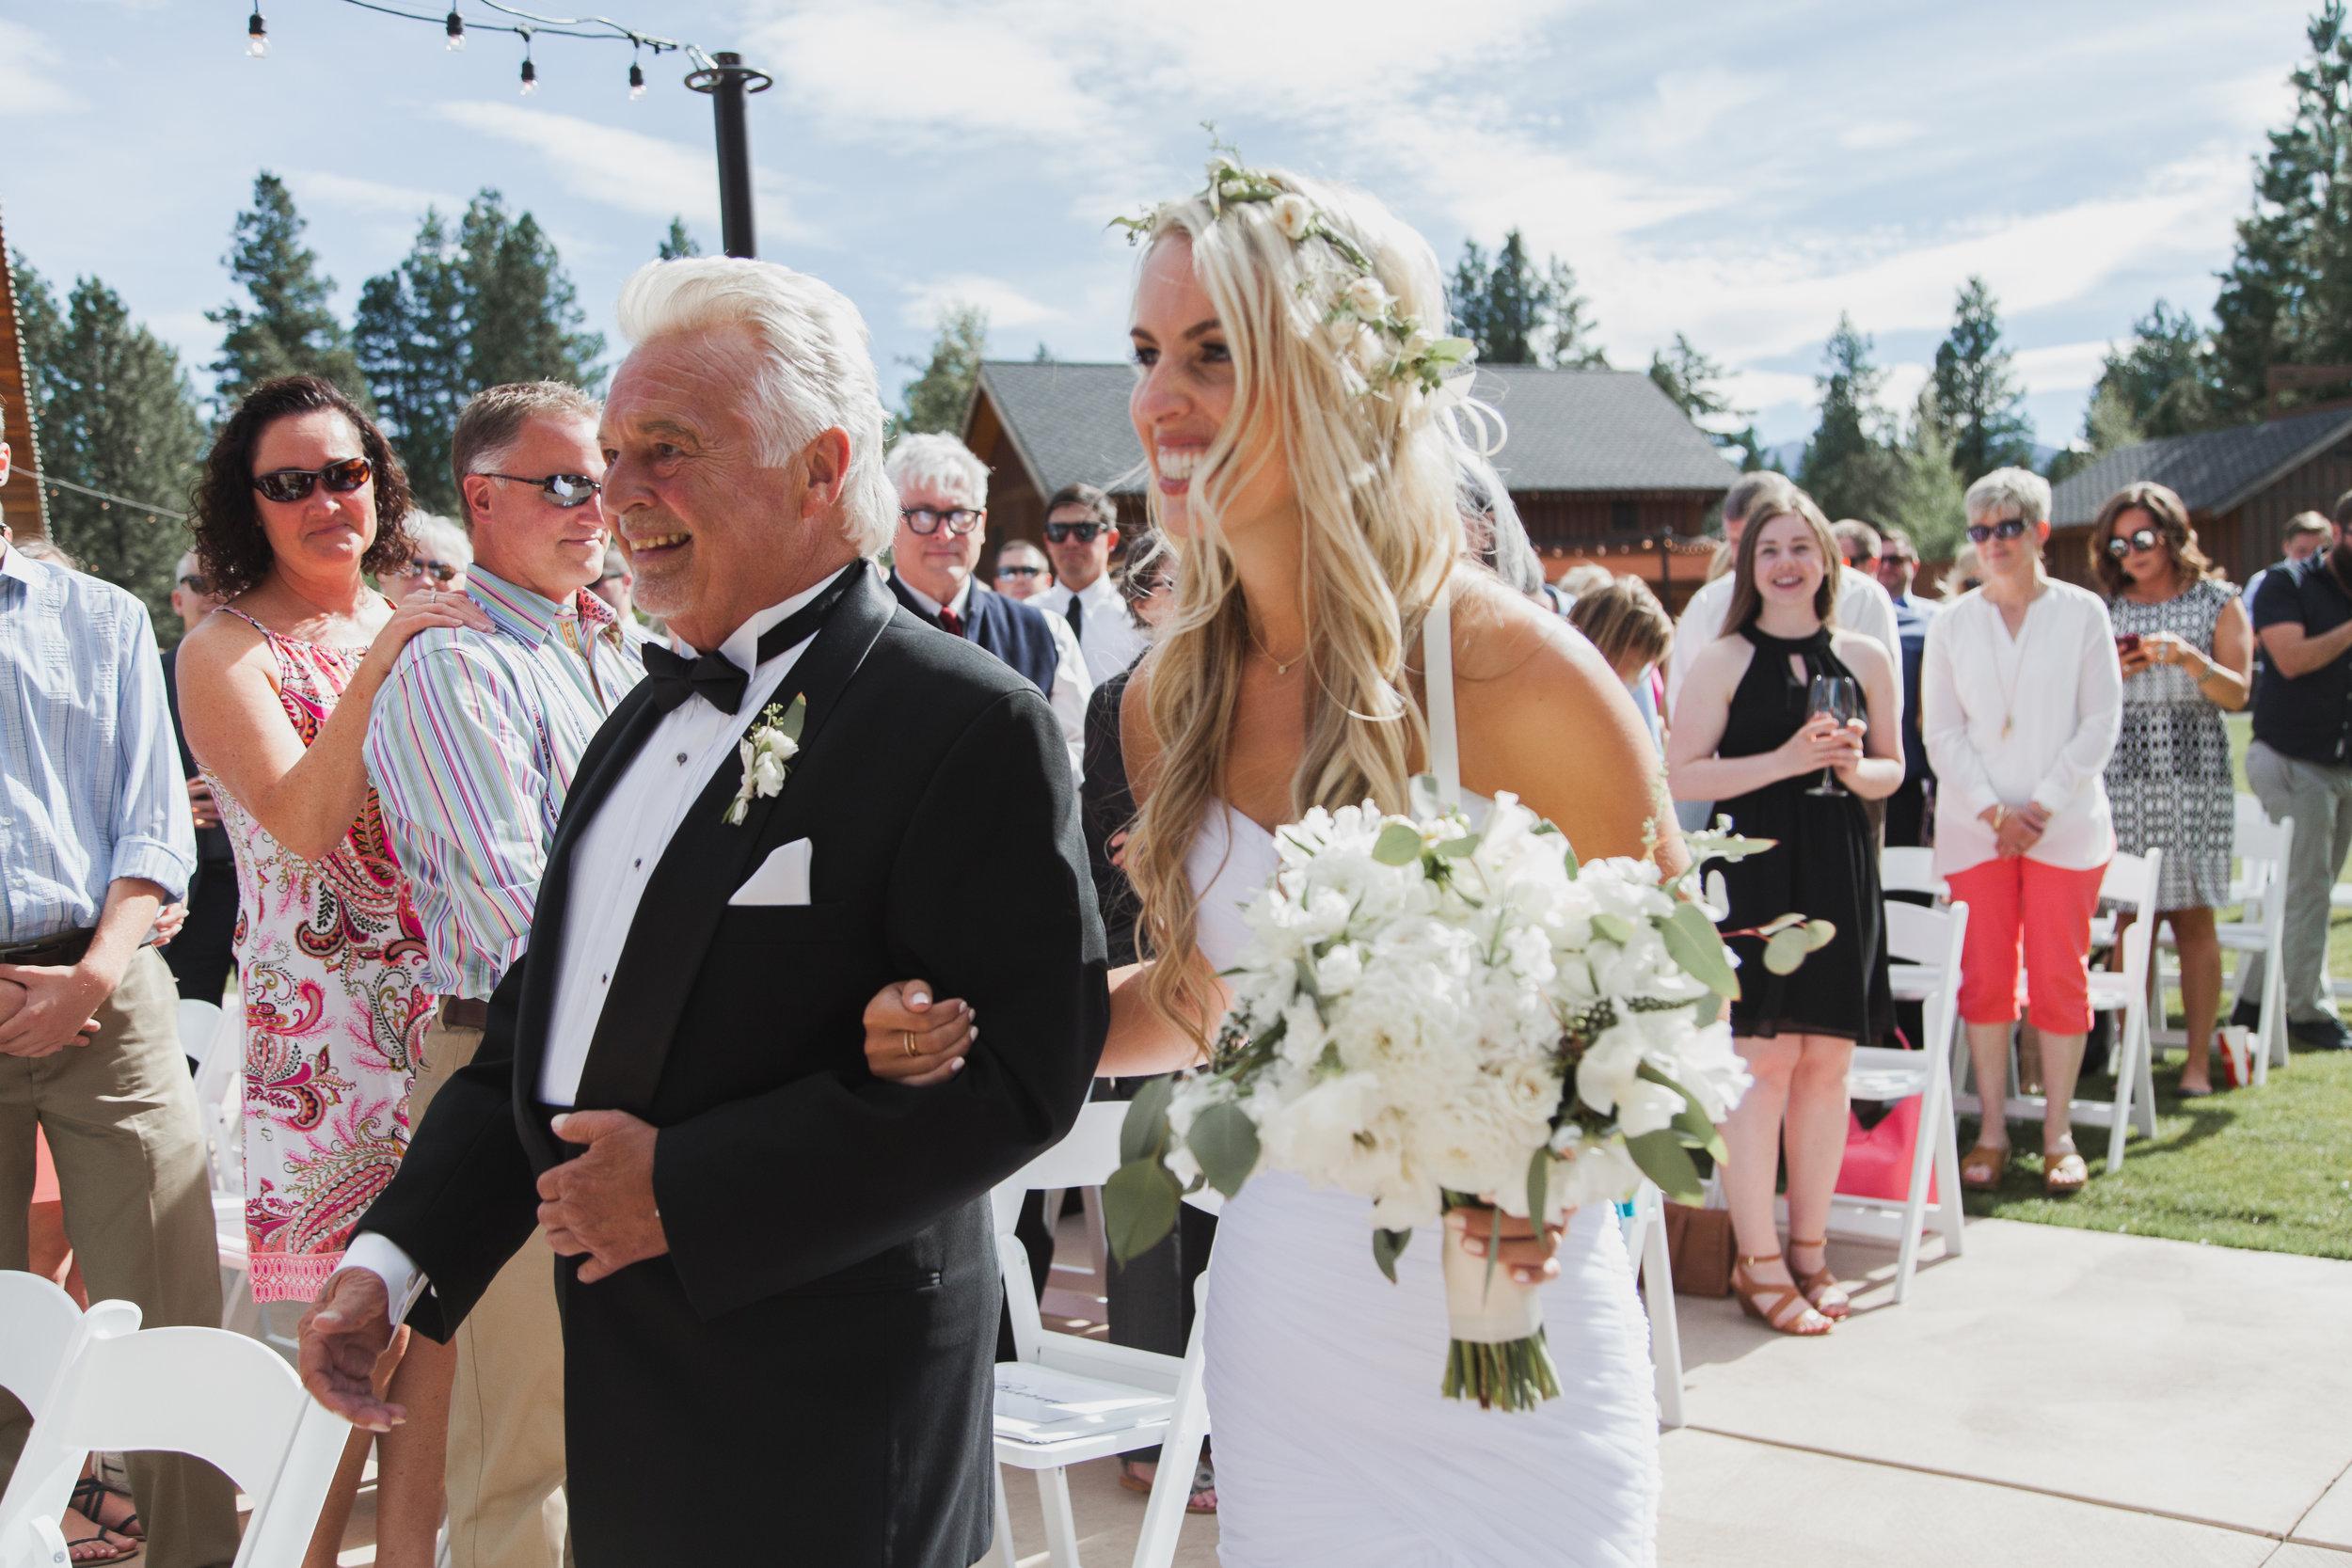 WEYER-WEDDING-DANCING-8.jpg